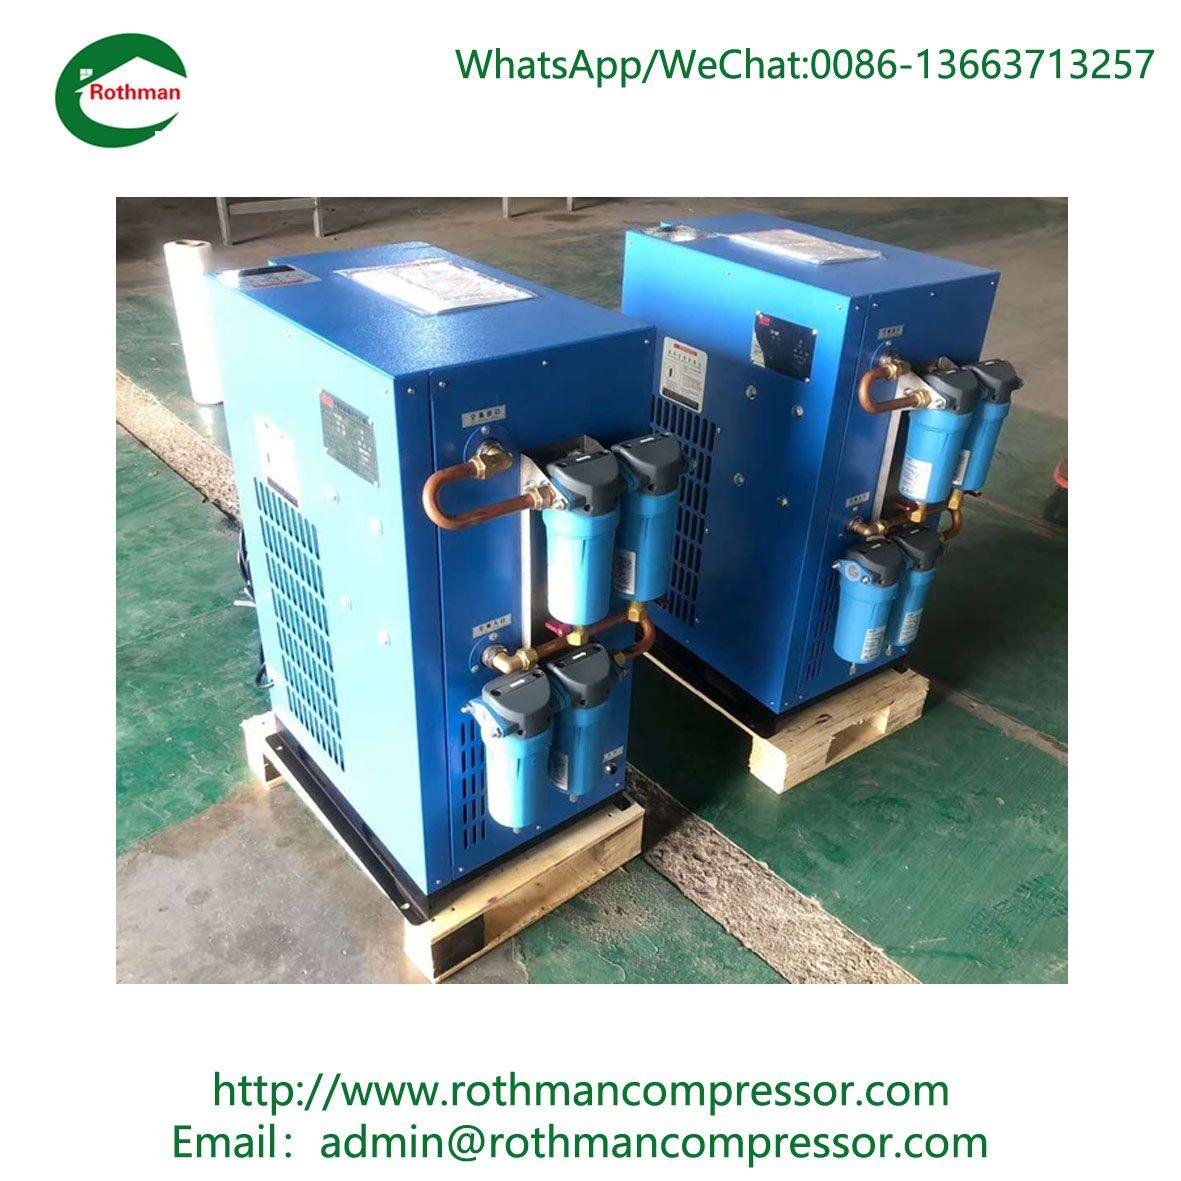 air compressor in 2020 Air compressor, Compressed air